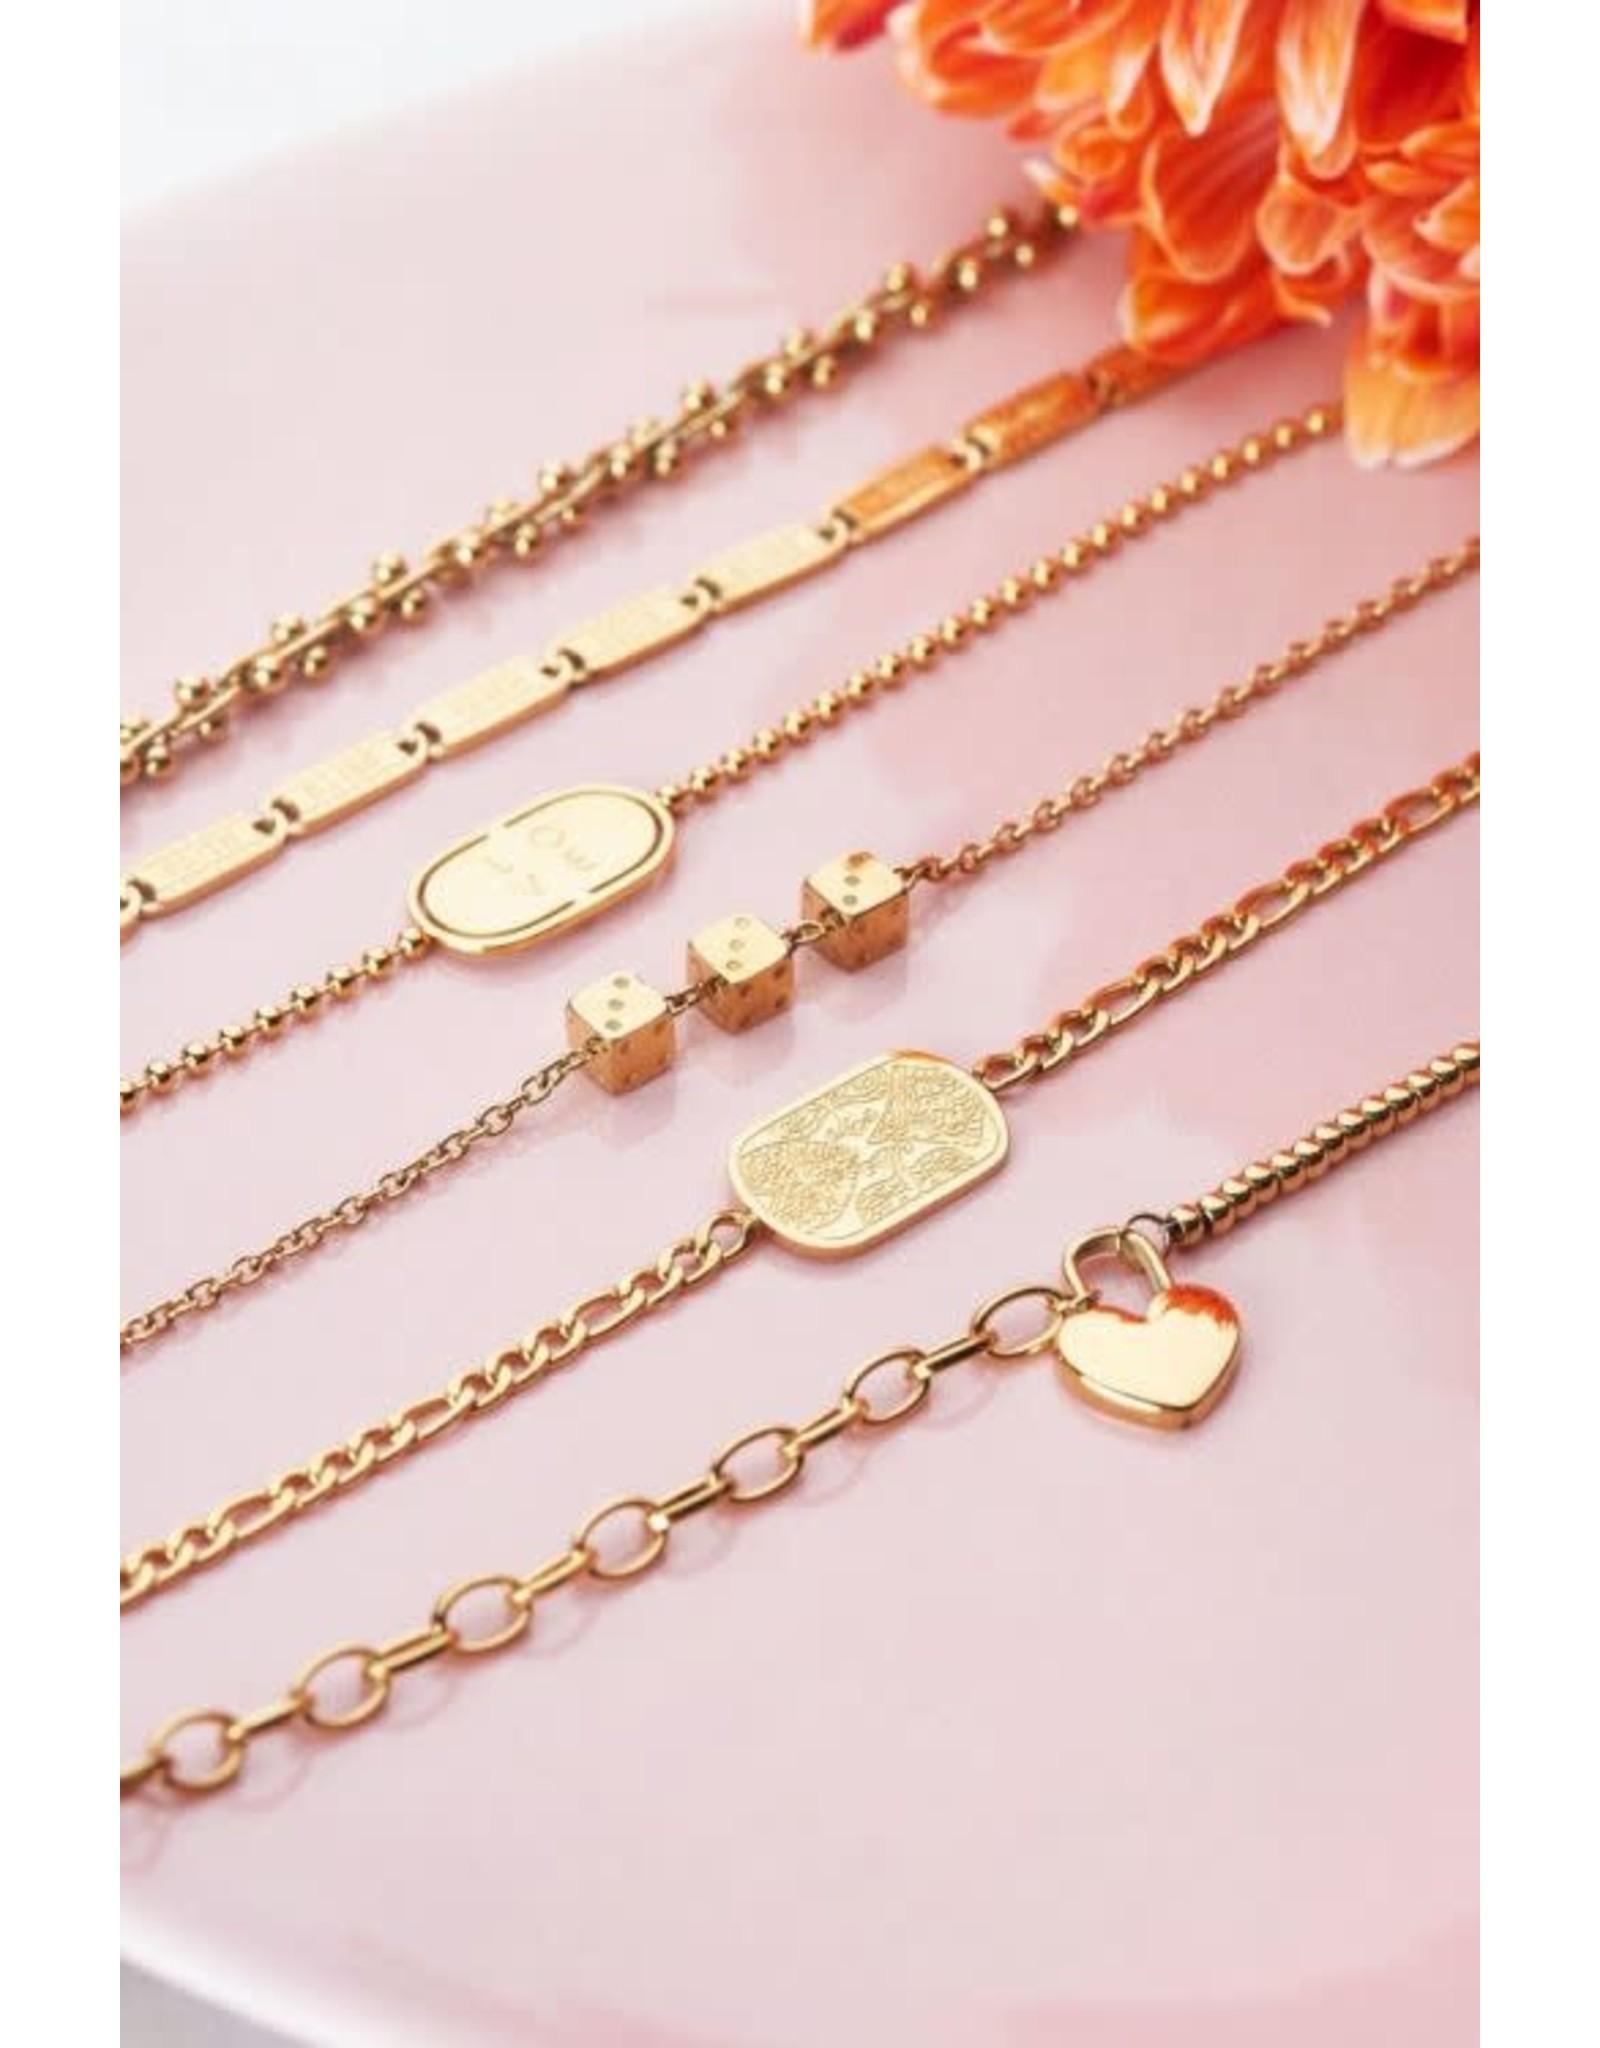 My Jewellery My Jewellery schakelarmband met plaatje